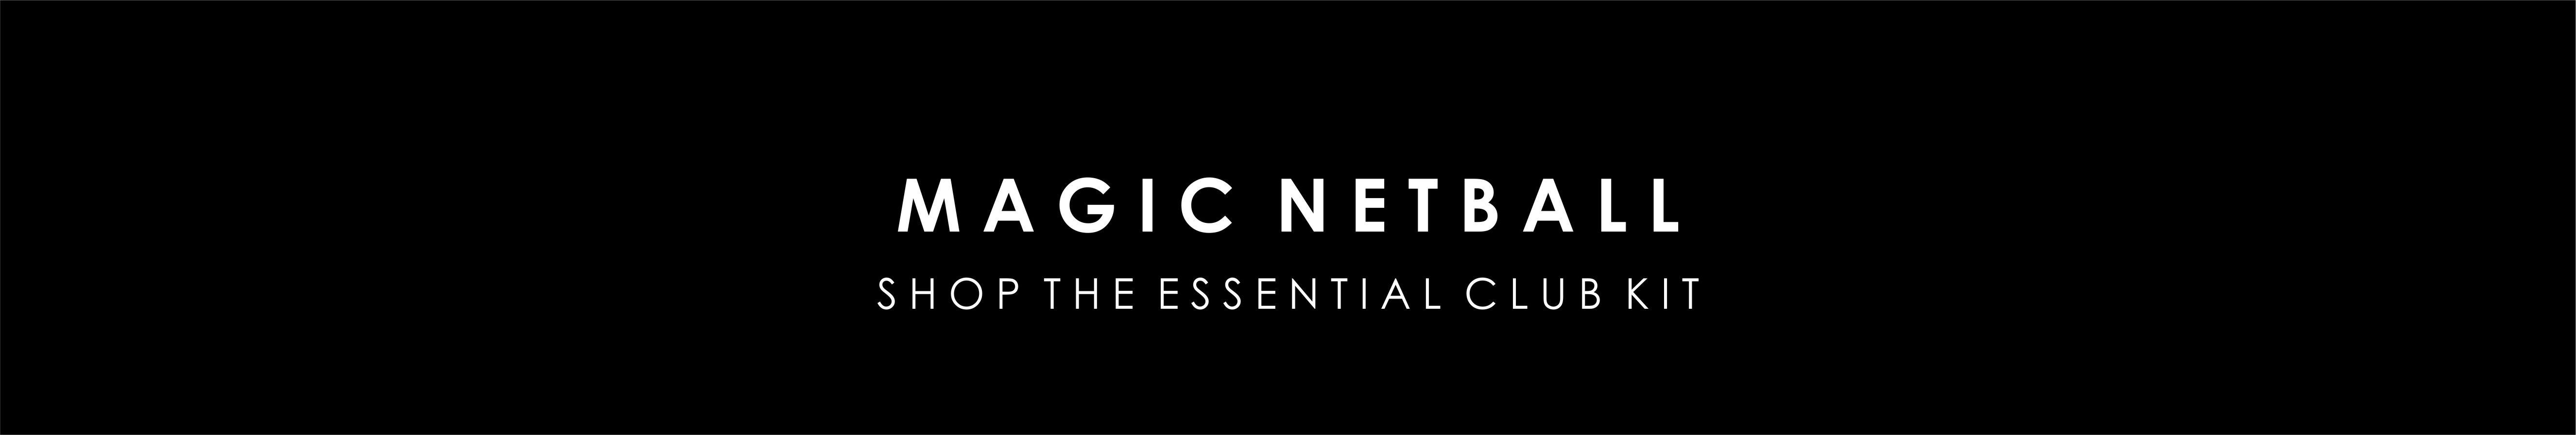 magic-netball-banner.jpg